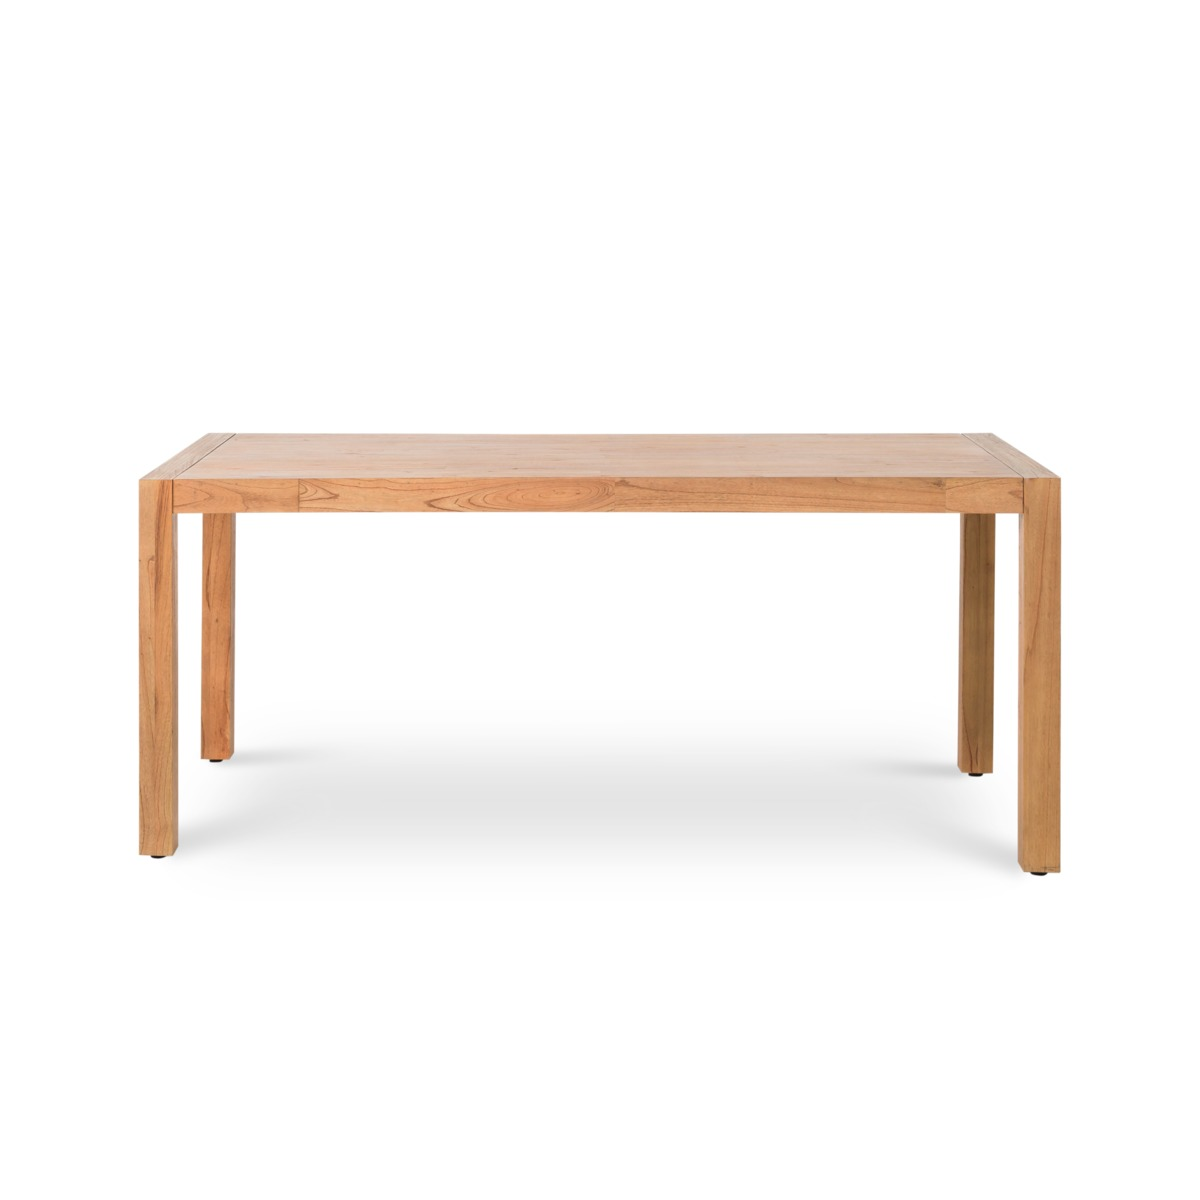 Alexander Dining Table, 160cm